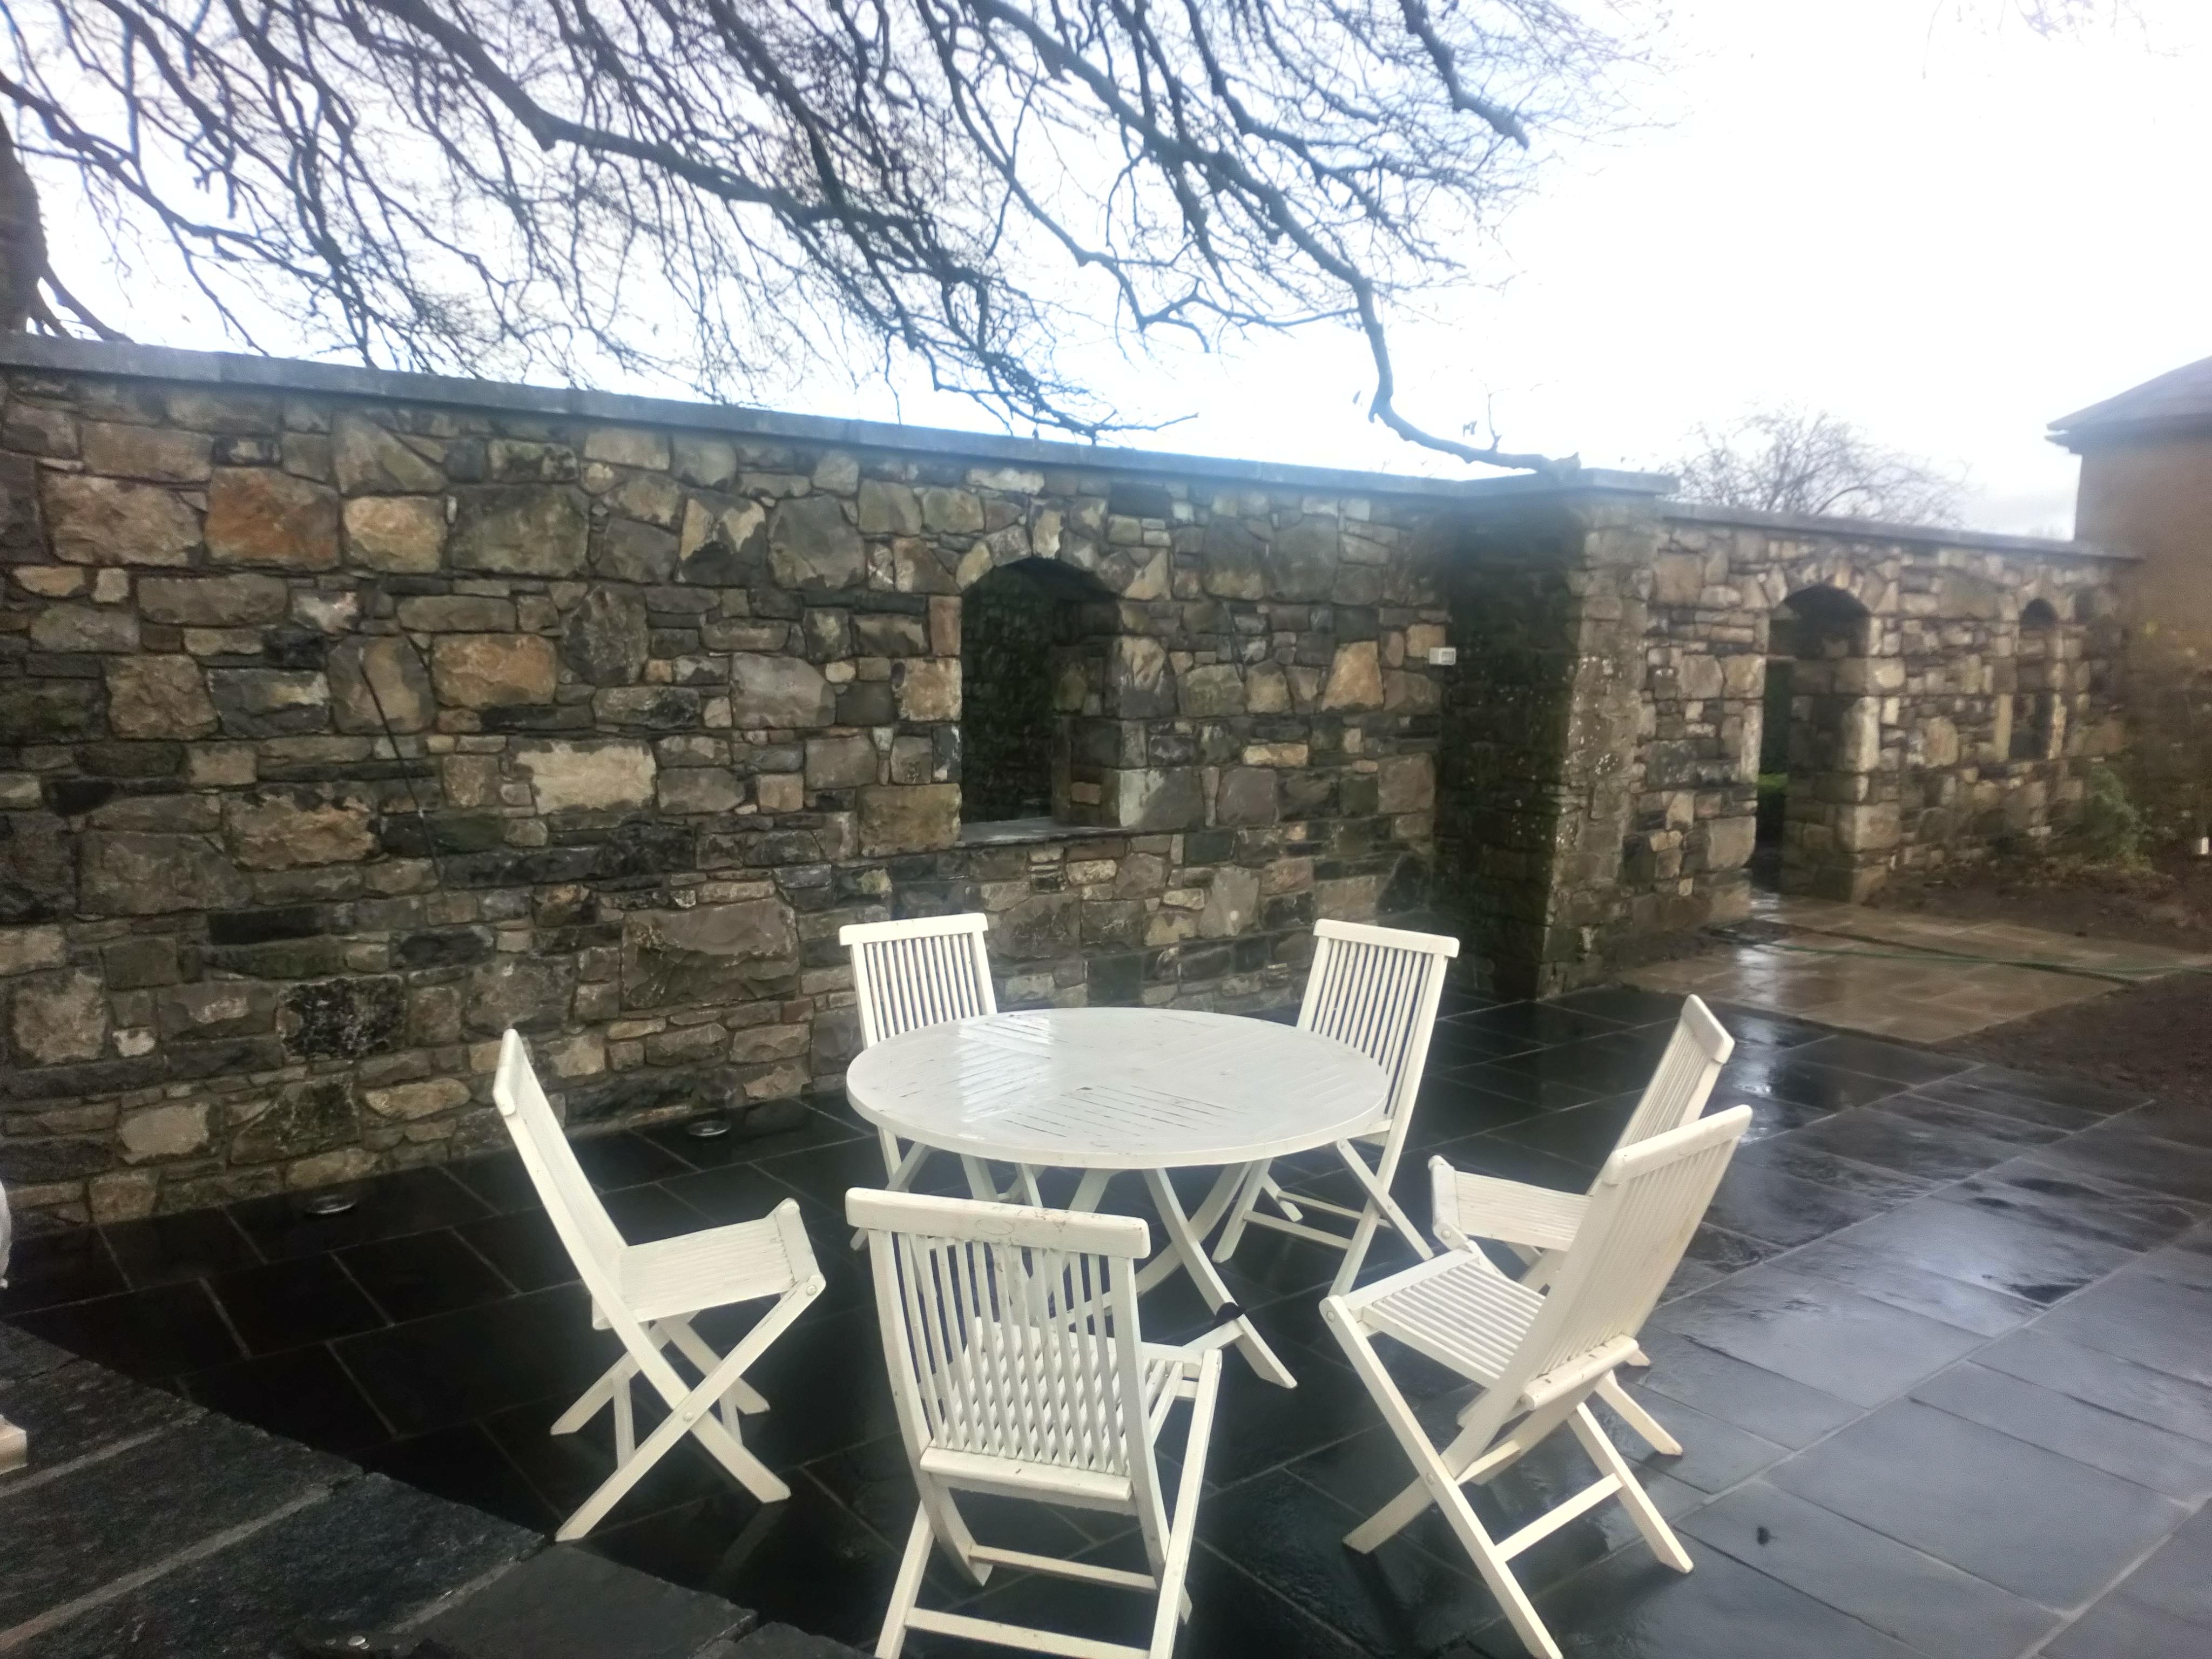 limestone wall and paving